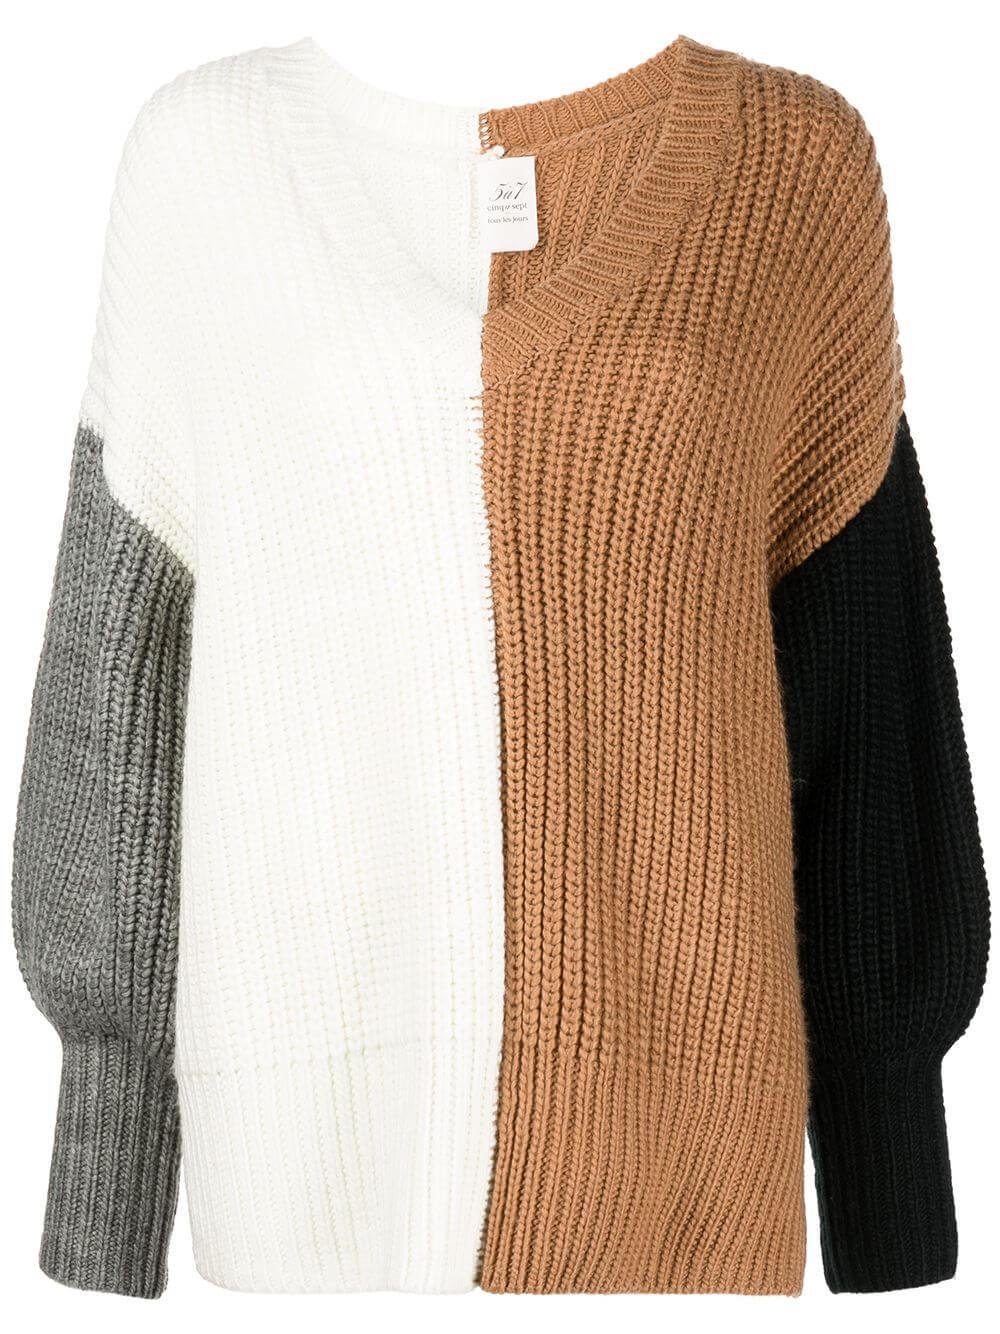 Colorblocked Antonella Sweater Item # ZK547C4133Z